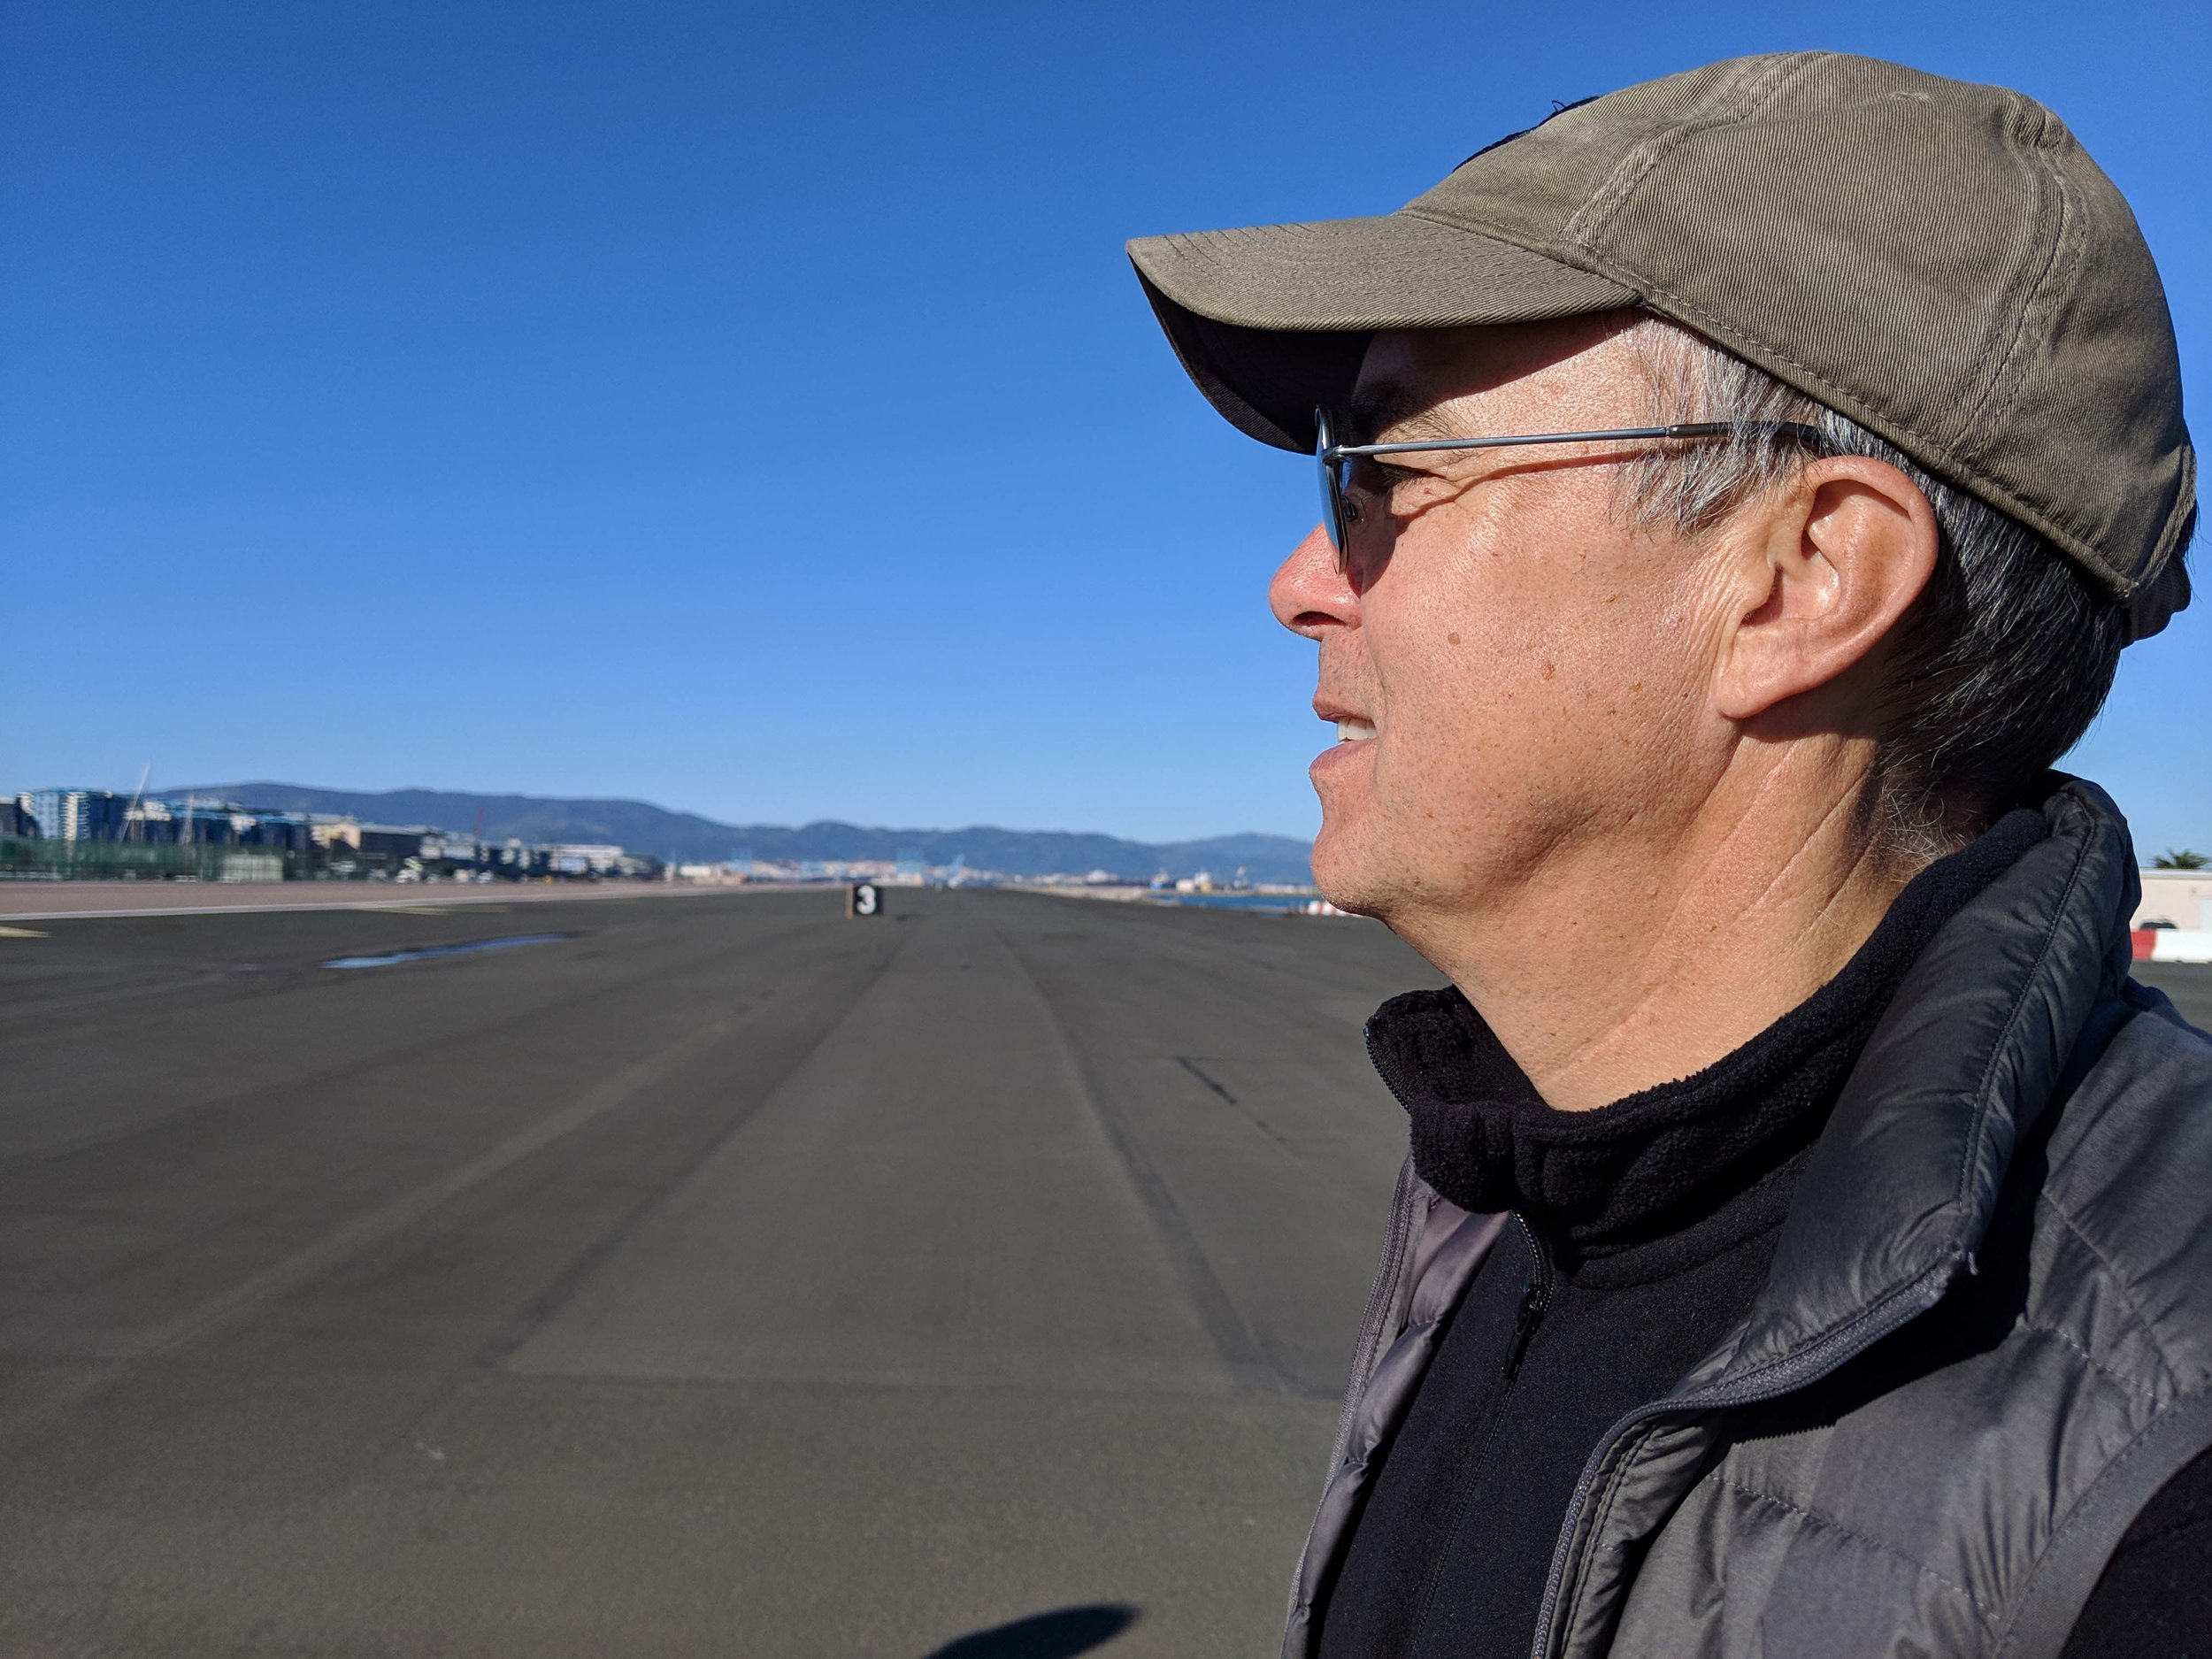 Walking across the runway